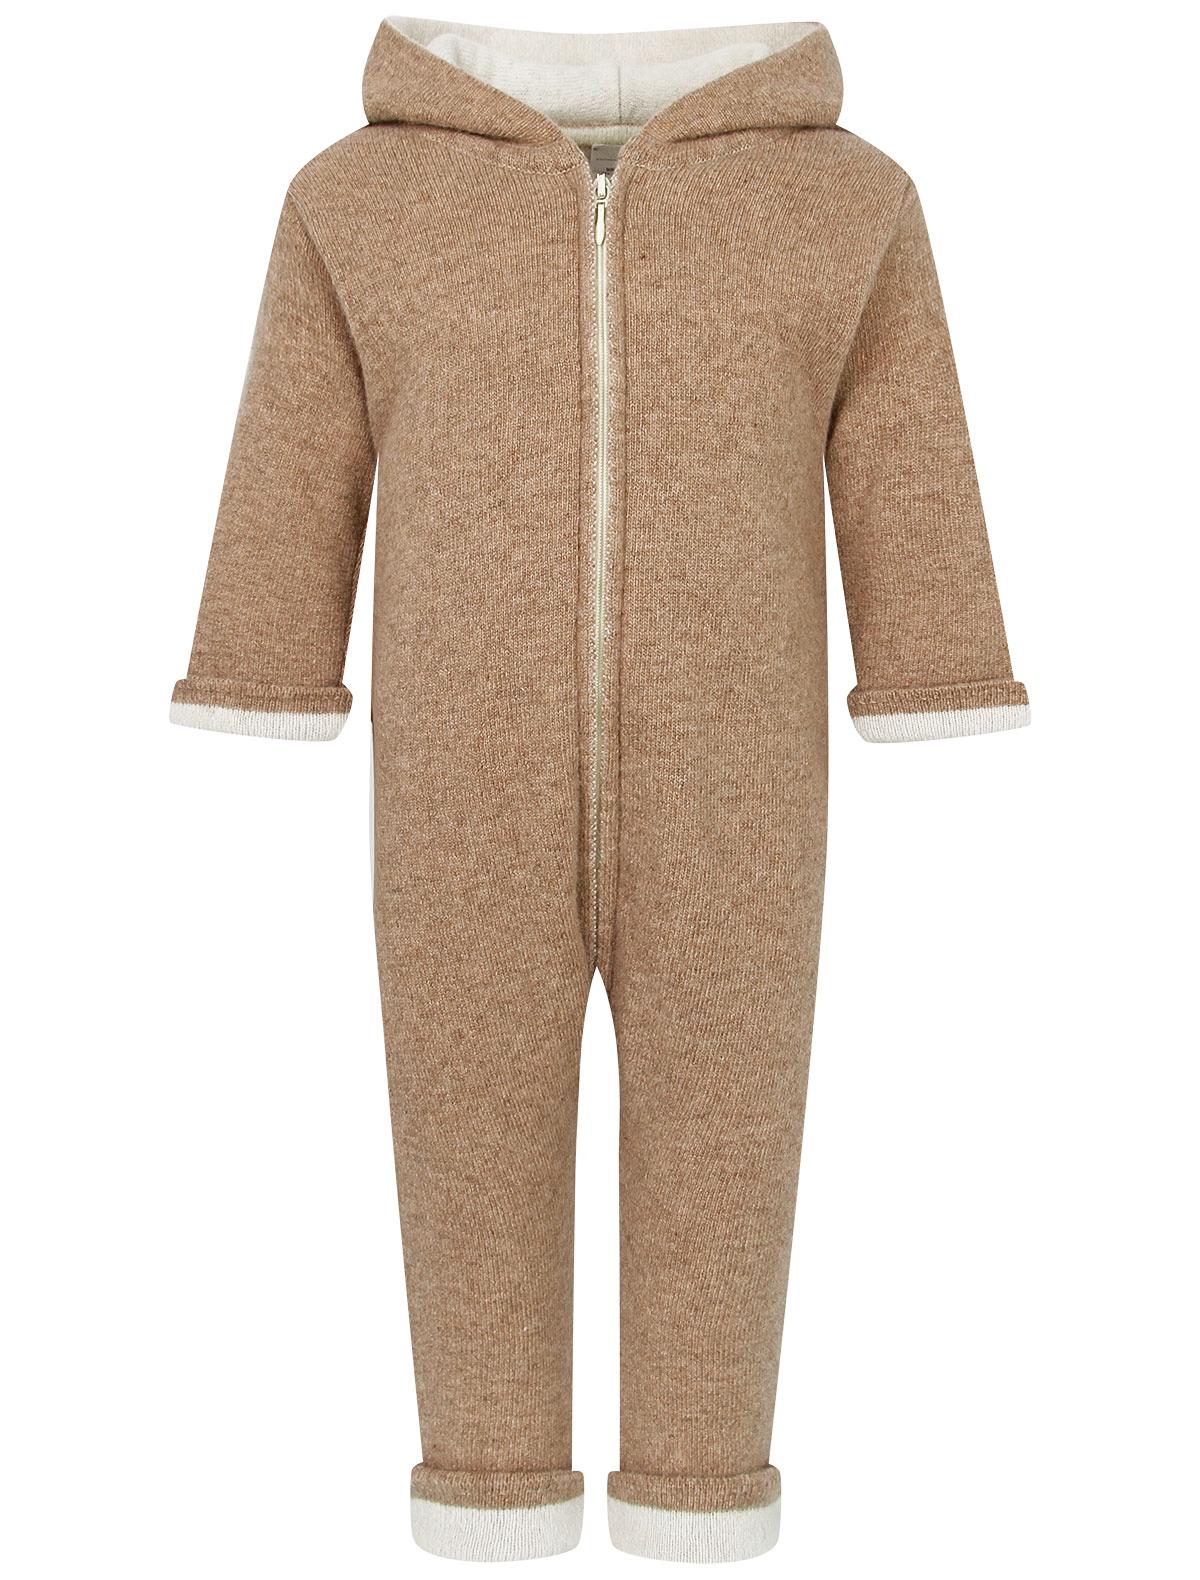 Купить 2256803, Комбинезон Air wool, бежевый, 1284529080449